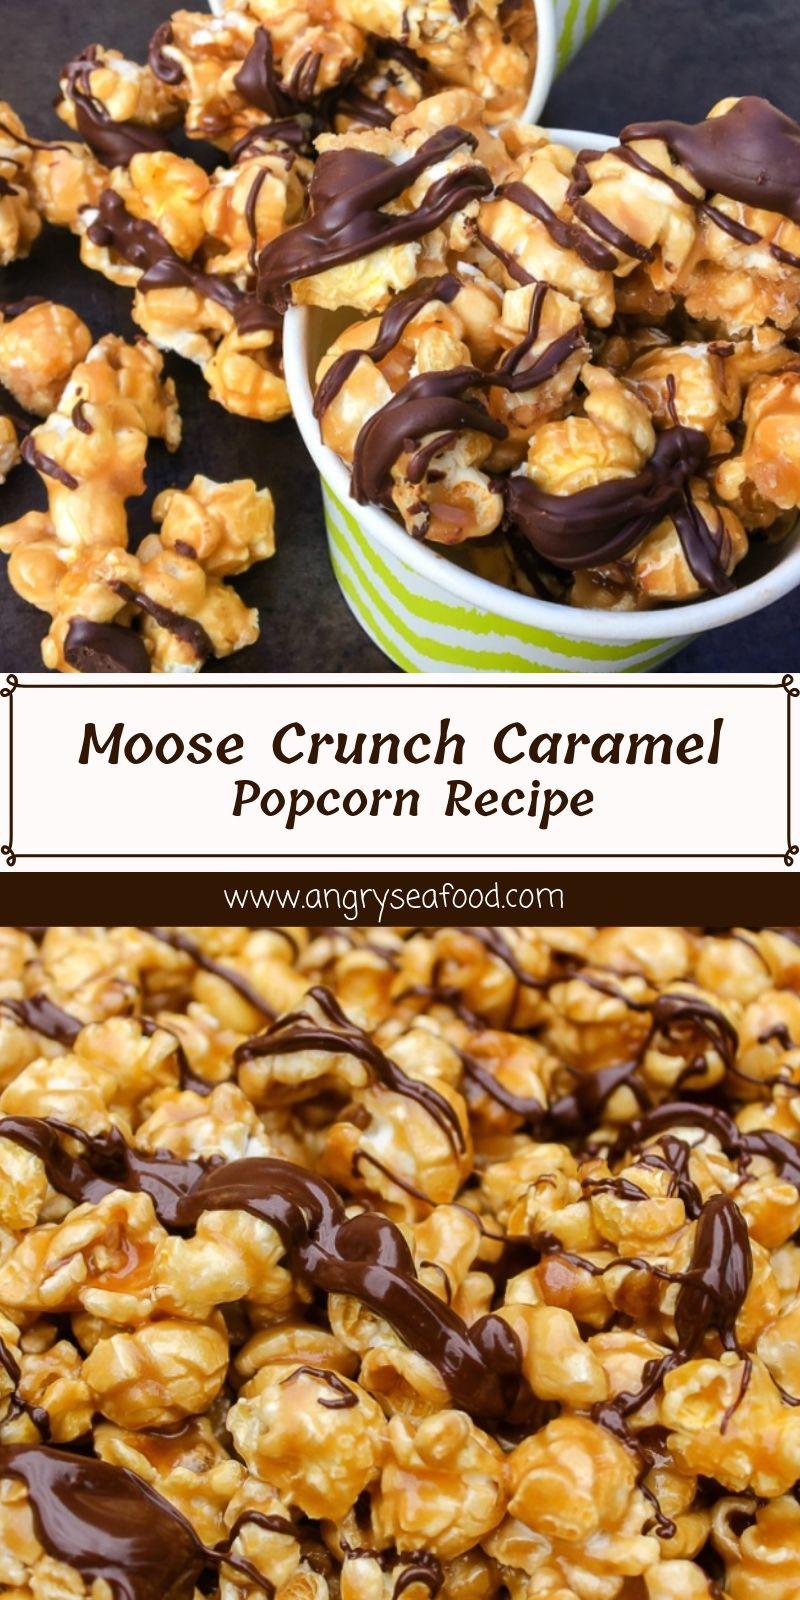 Moose Crunch Caramel Popcorn Recipe